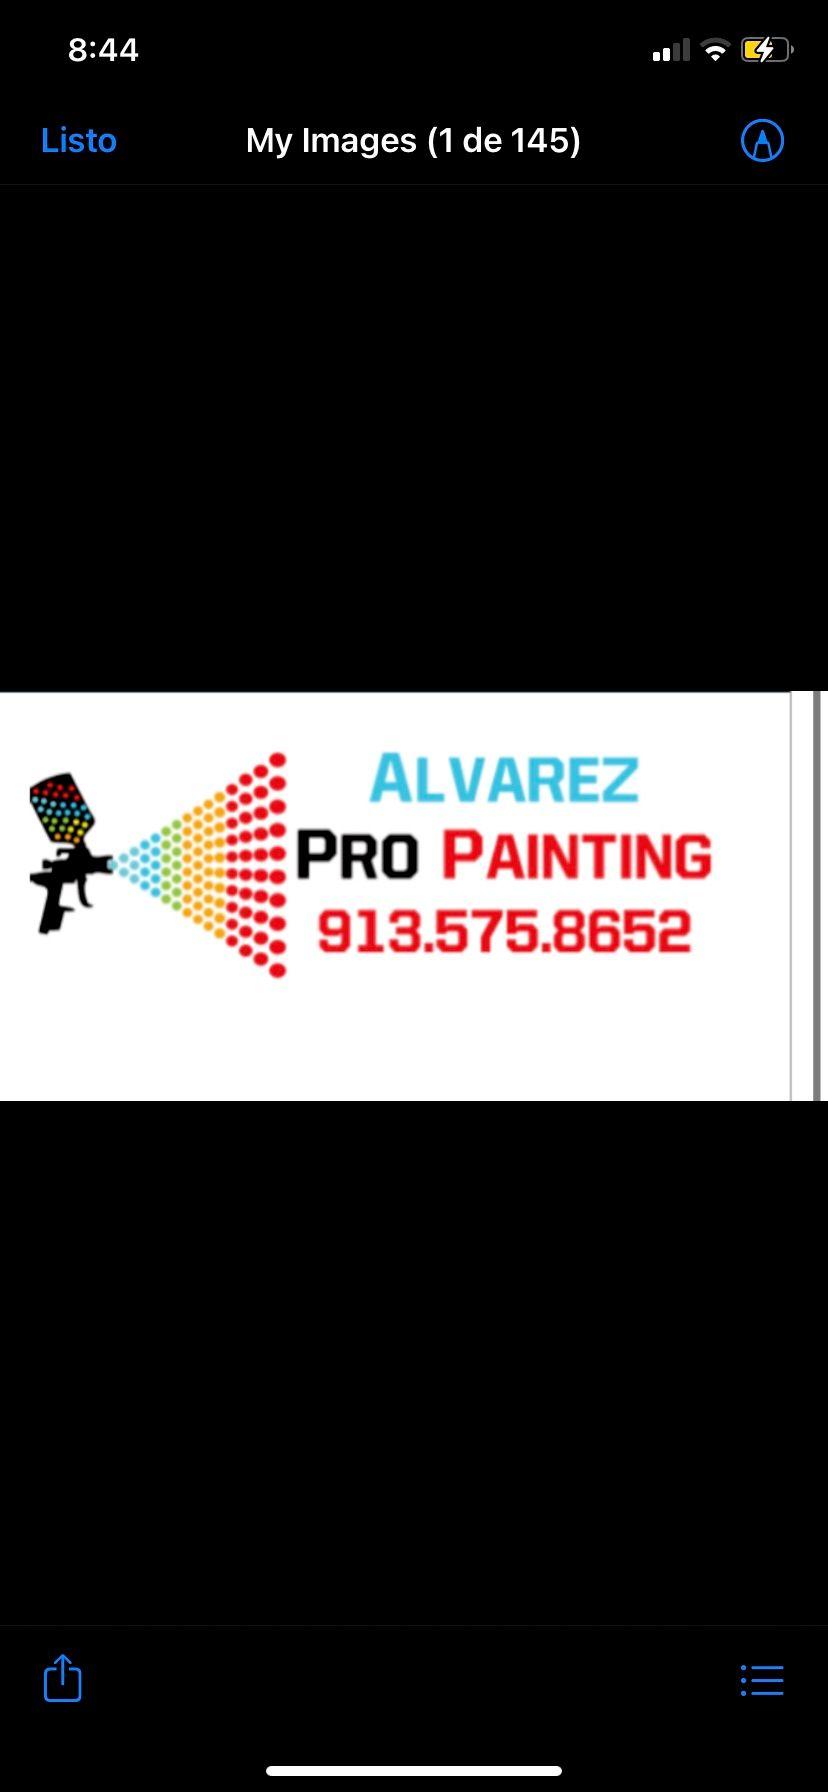 ALVAREZ PRO PAINTING